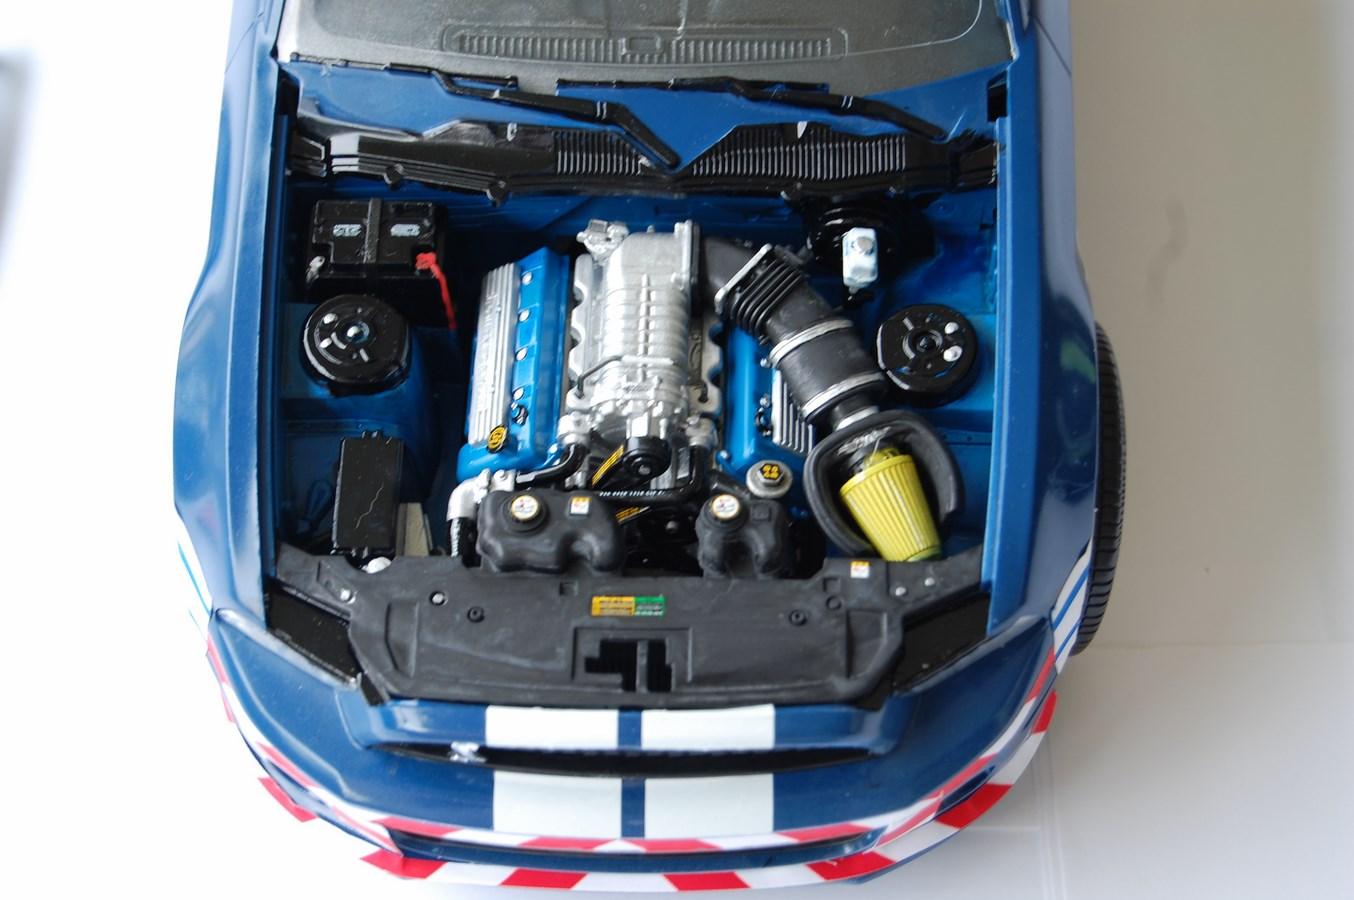 Shelby GT 500 version imaginaire Gendarmerie - Page 2 989048Mustang45Copier